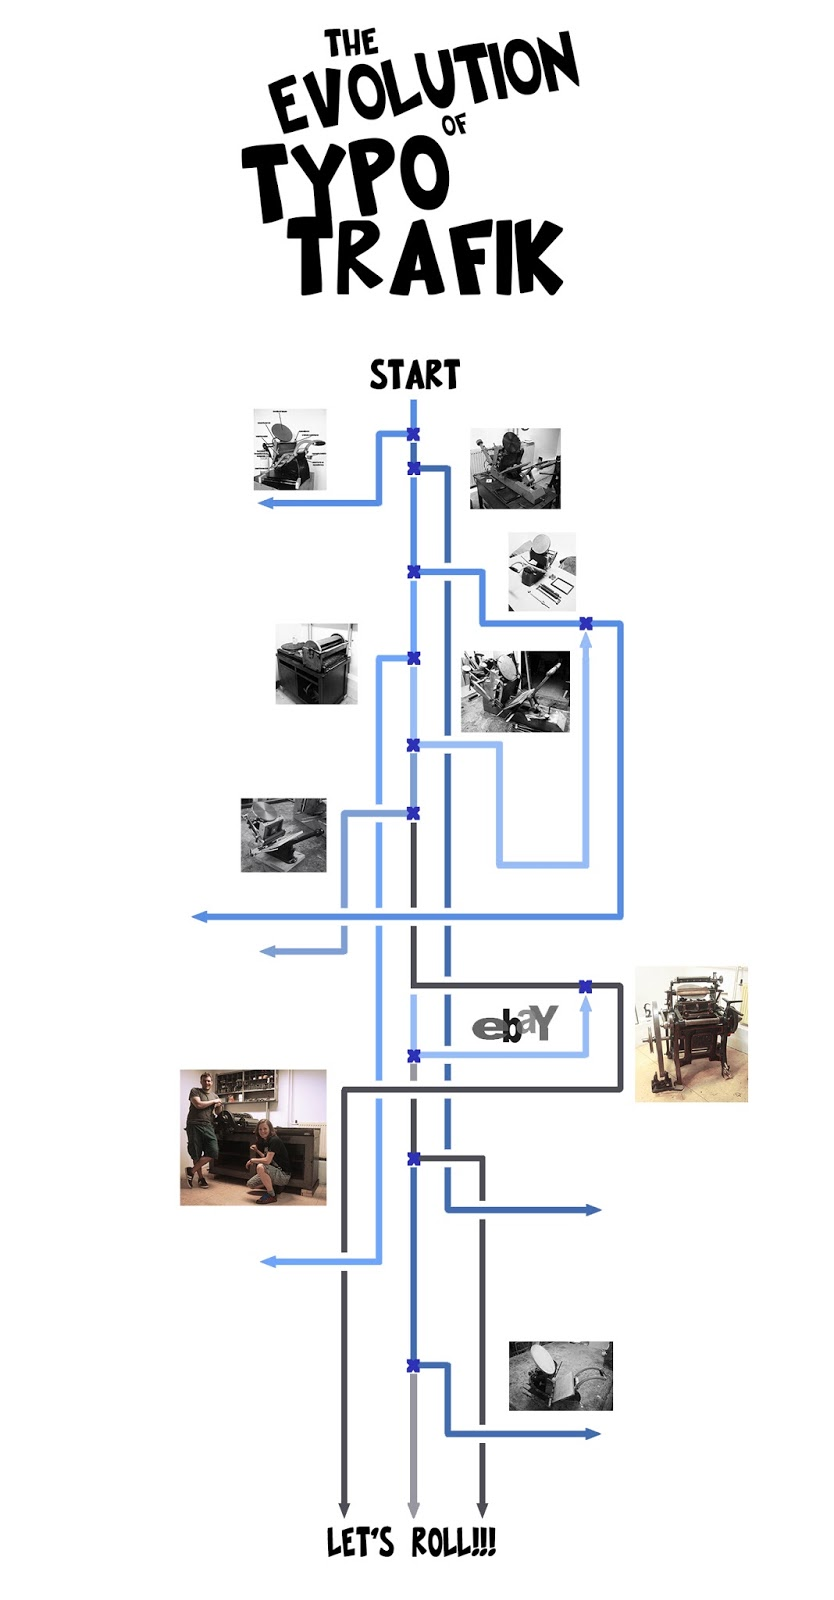 117 2 The-evolution-of-TypoTrafik-W.jpg